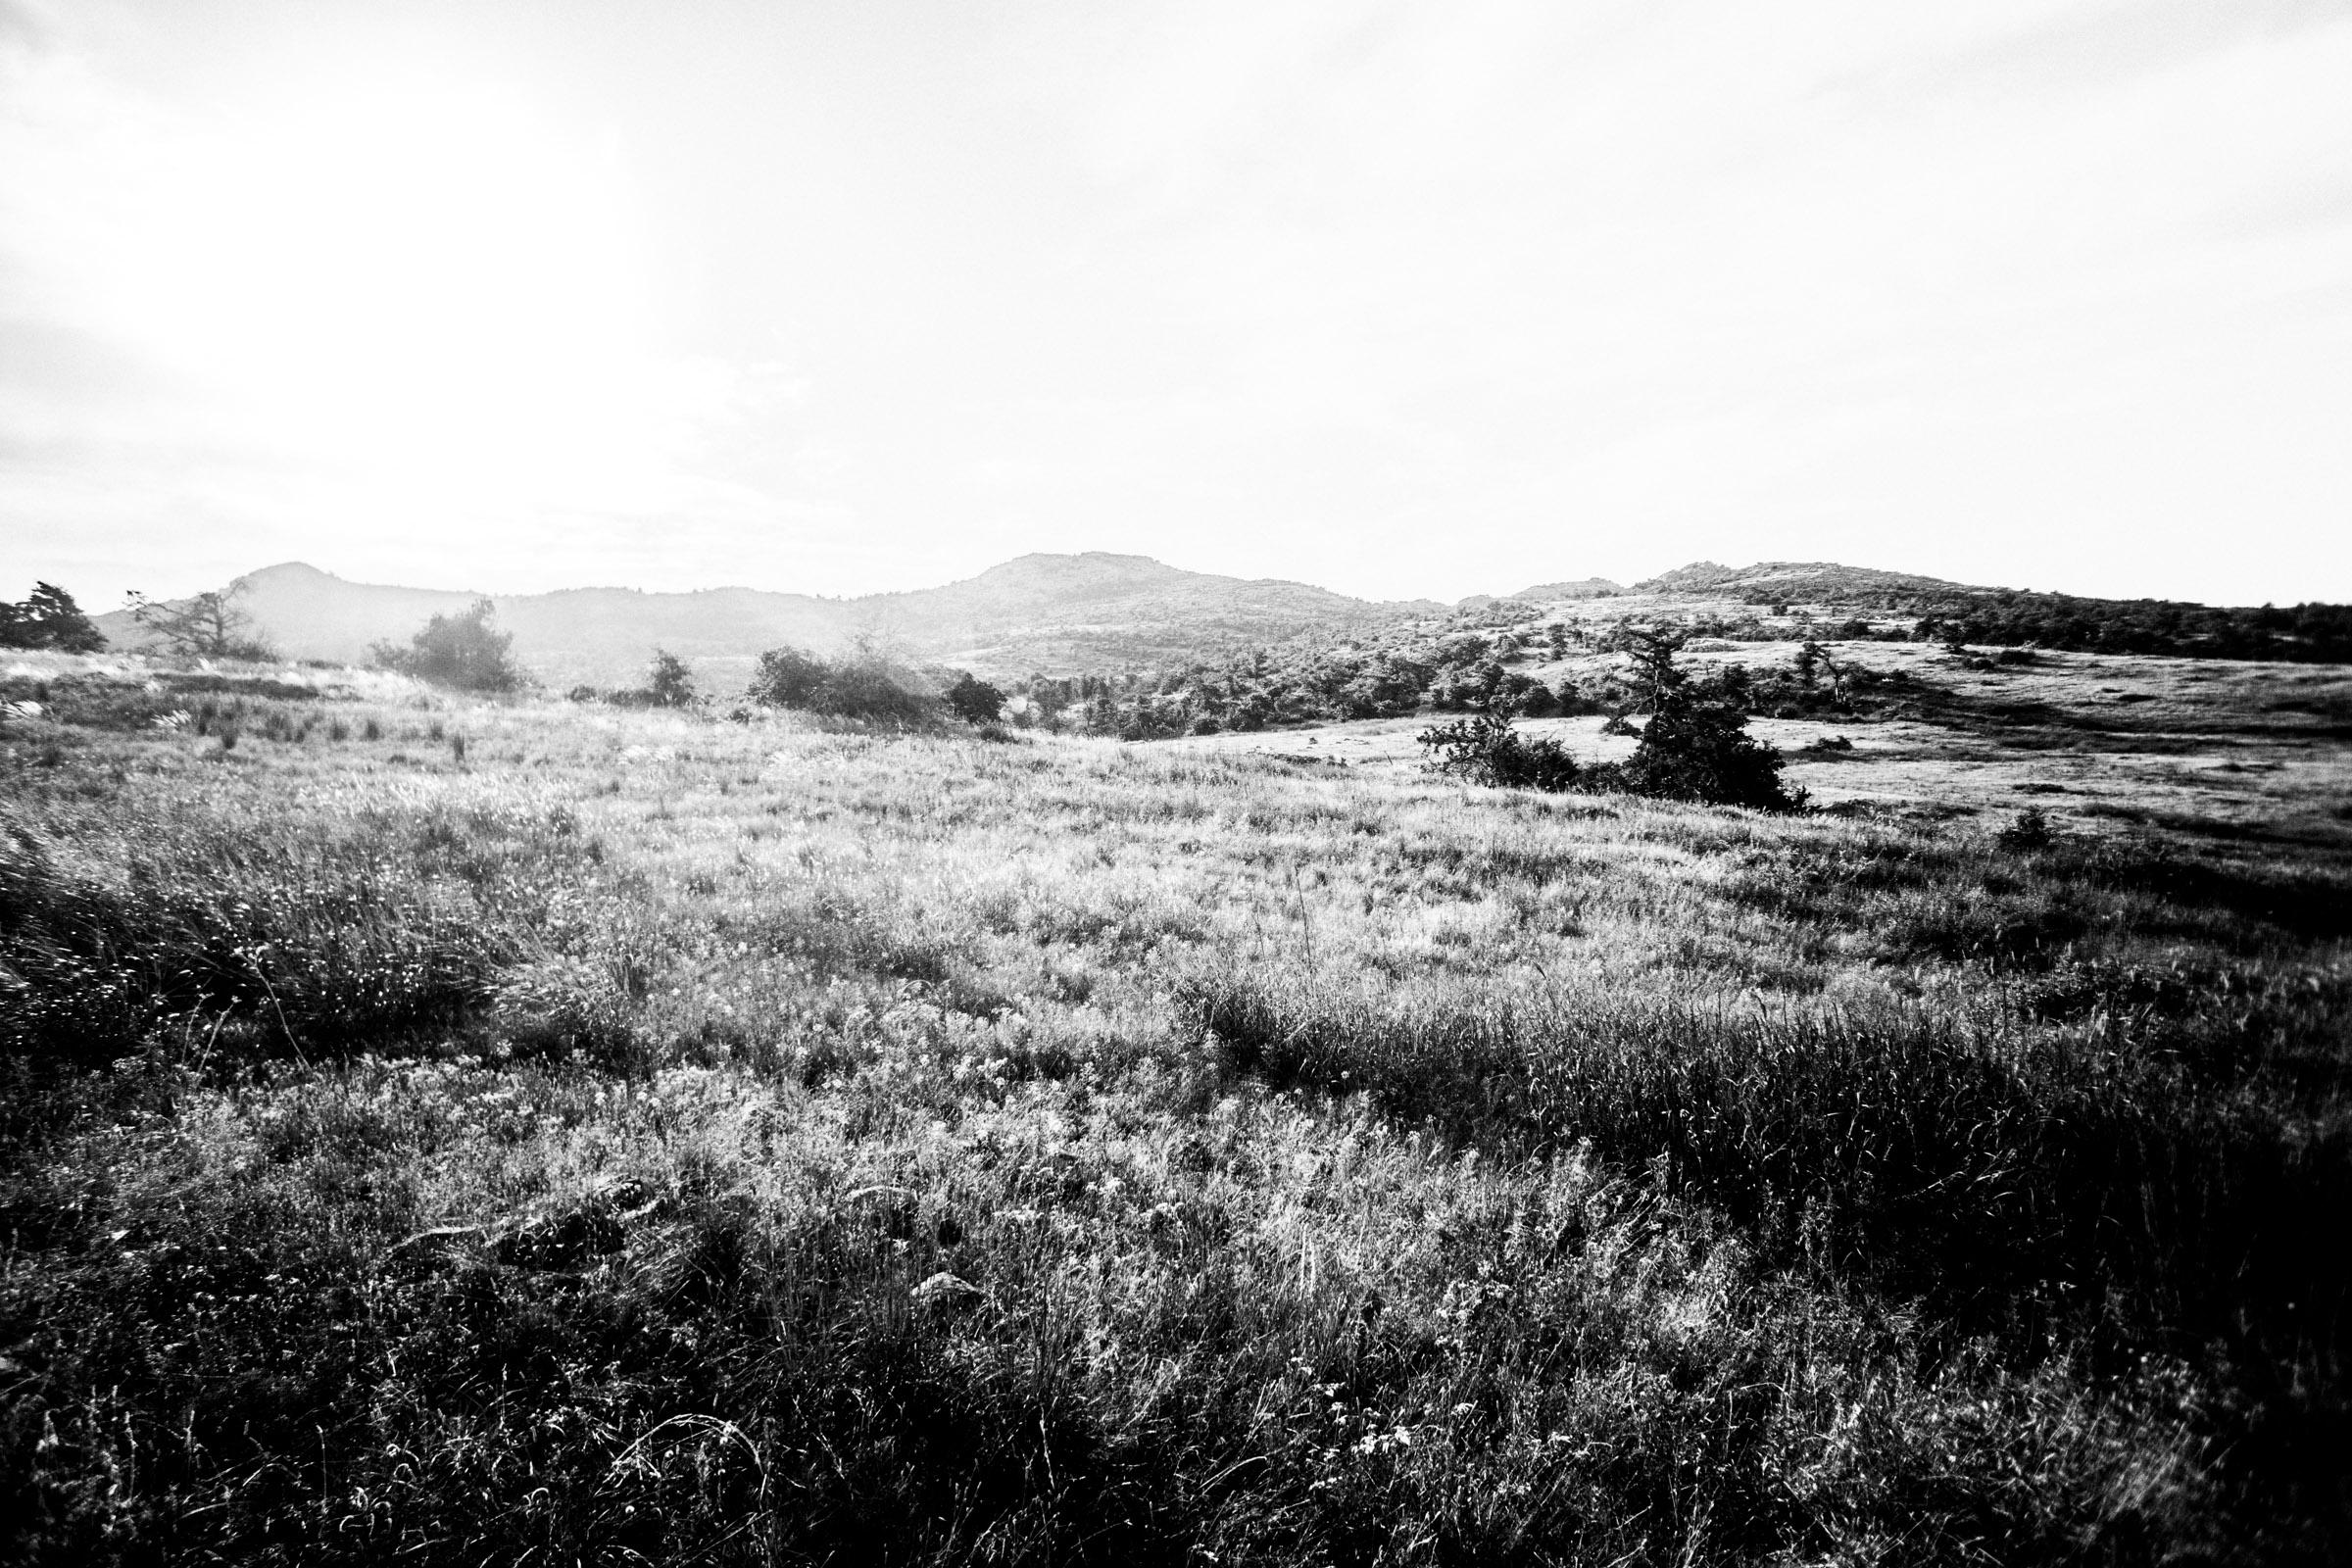 Mount Mitchell B&W 08-07-16 (7 of 35).jpg